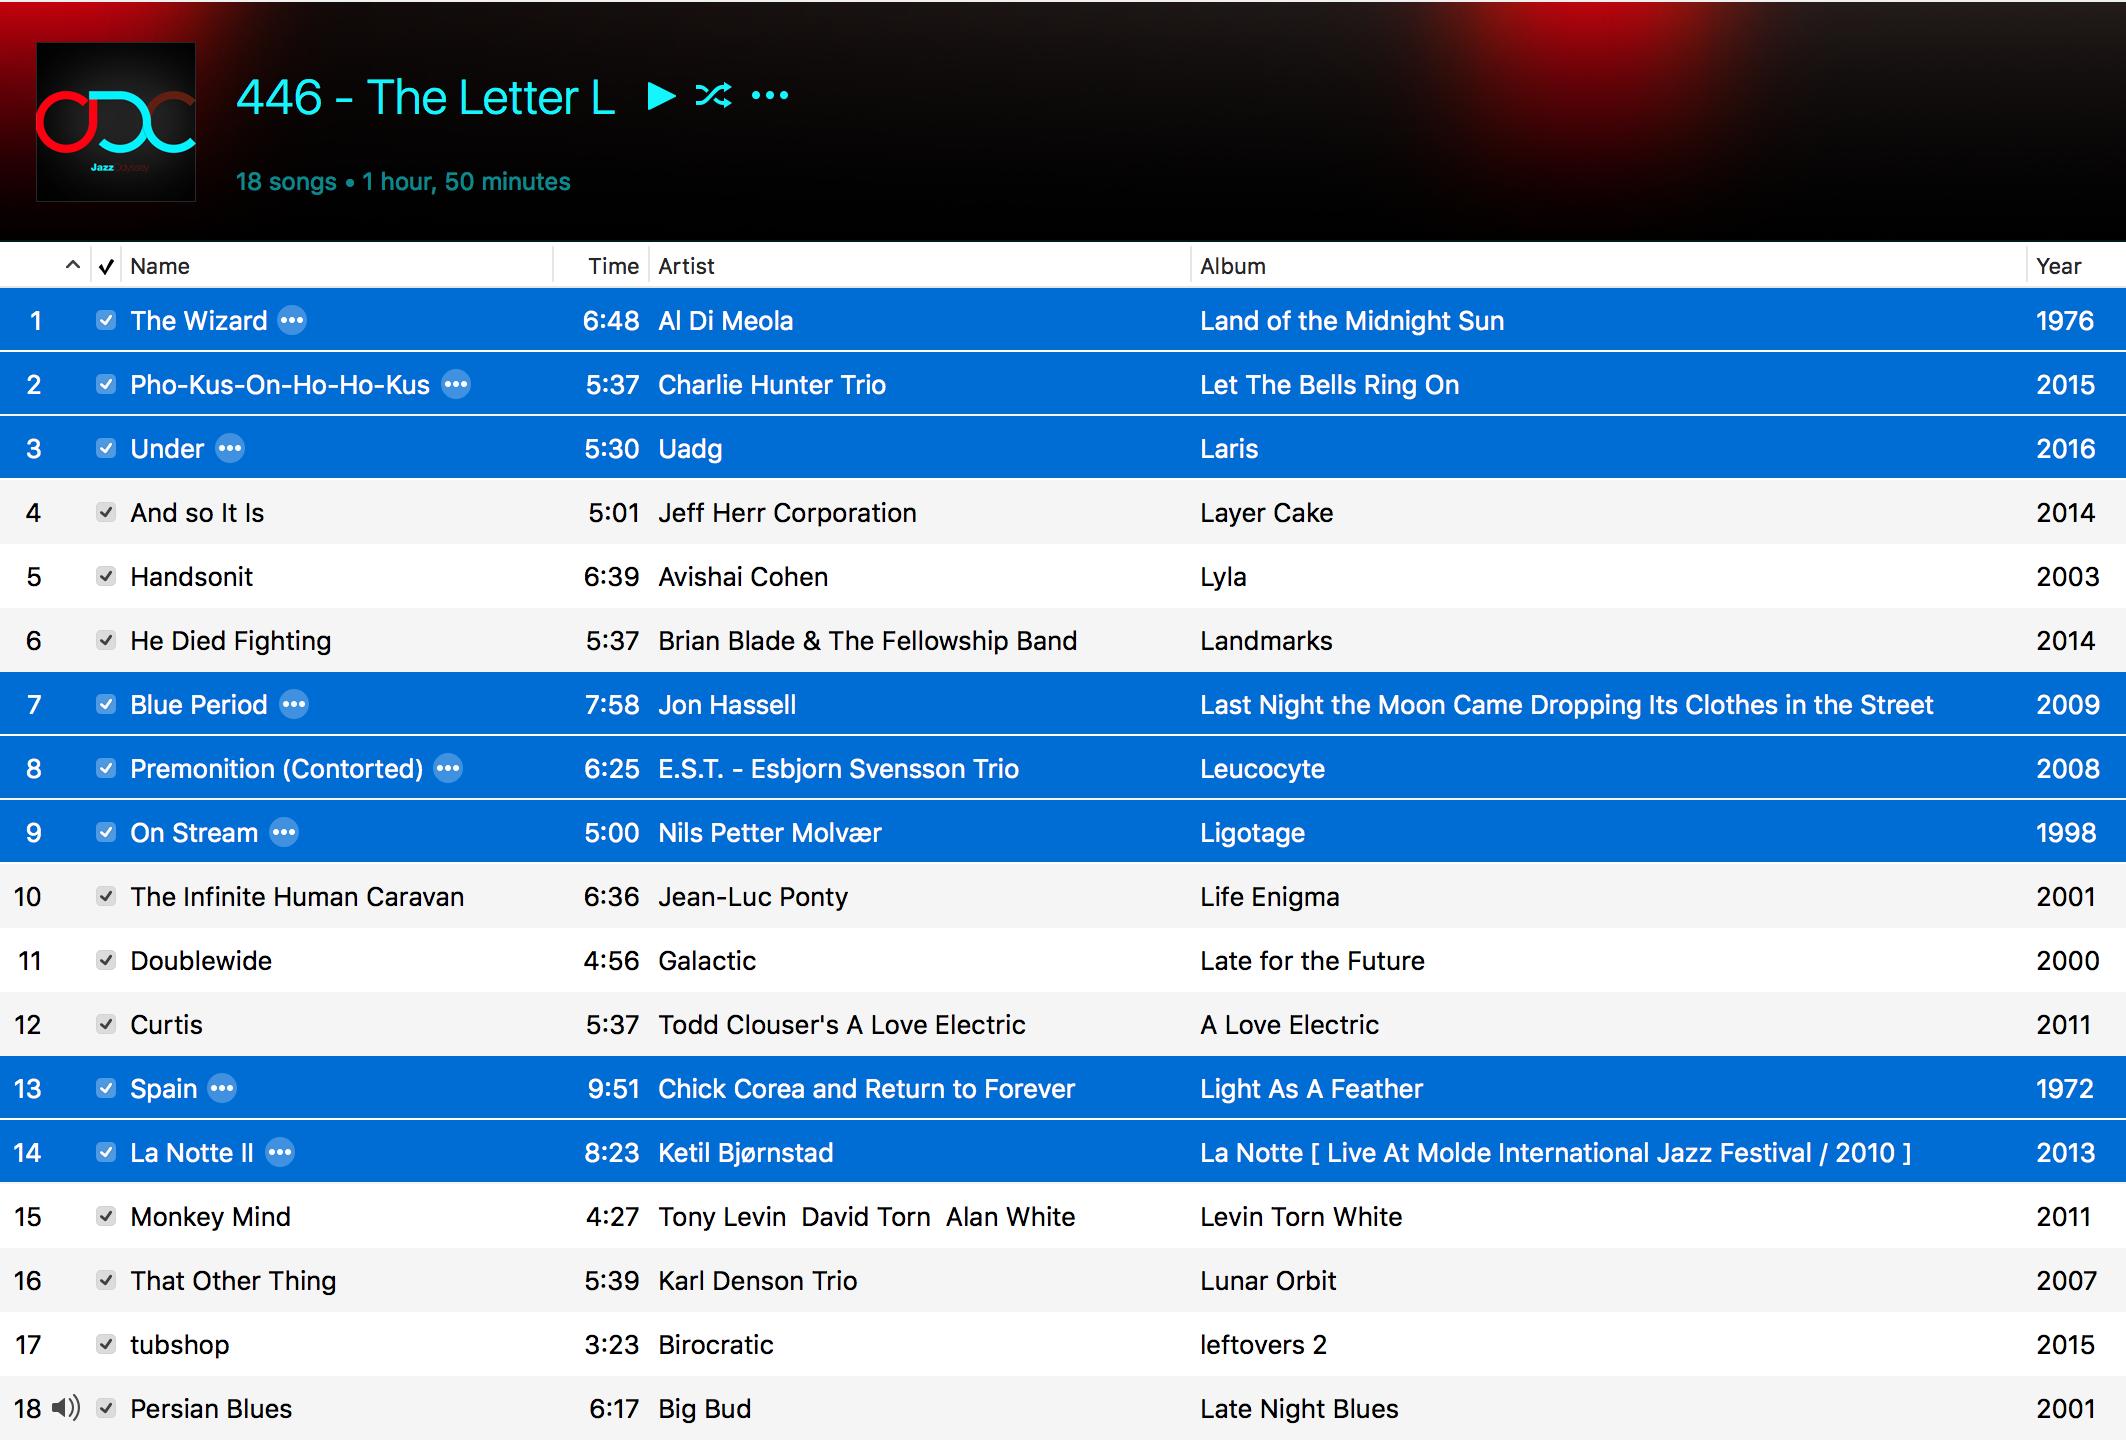 Jazz ODC #446 - The Letter L - Playlist